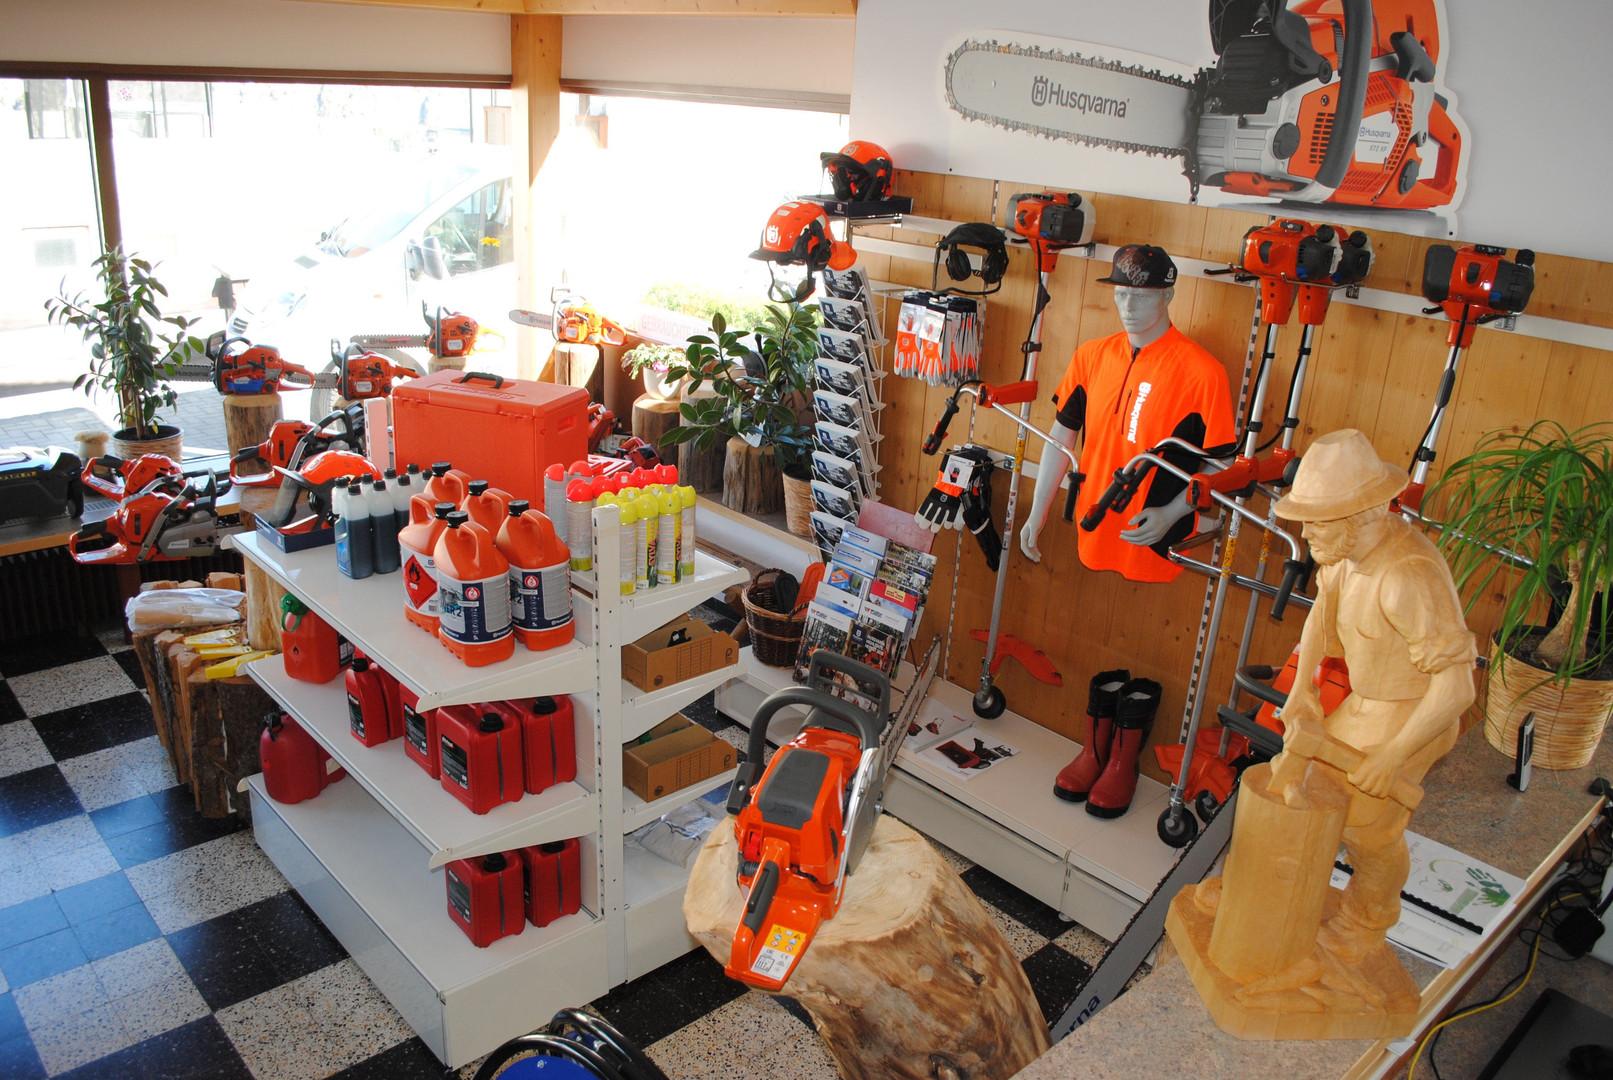 Verkauf Landmaschinen Tirol.jpg